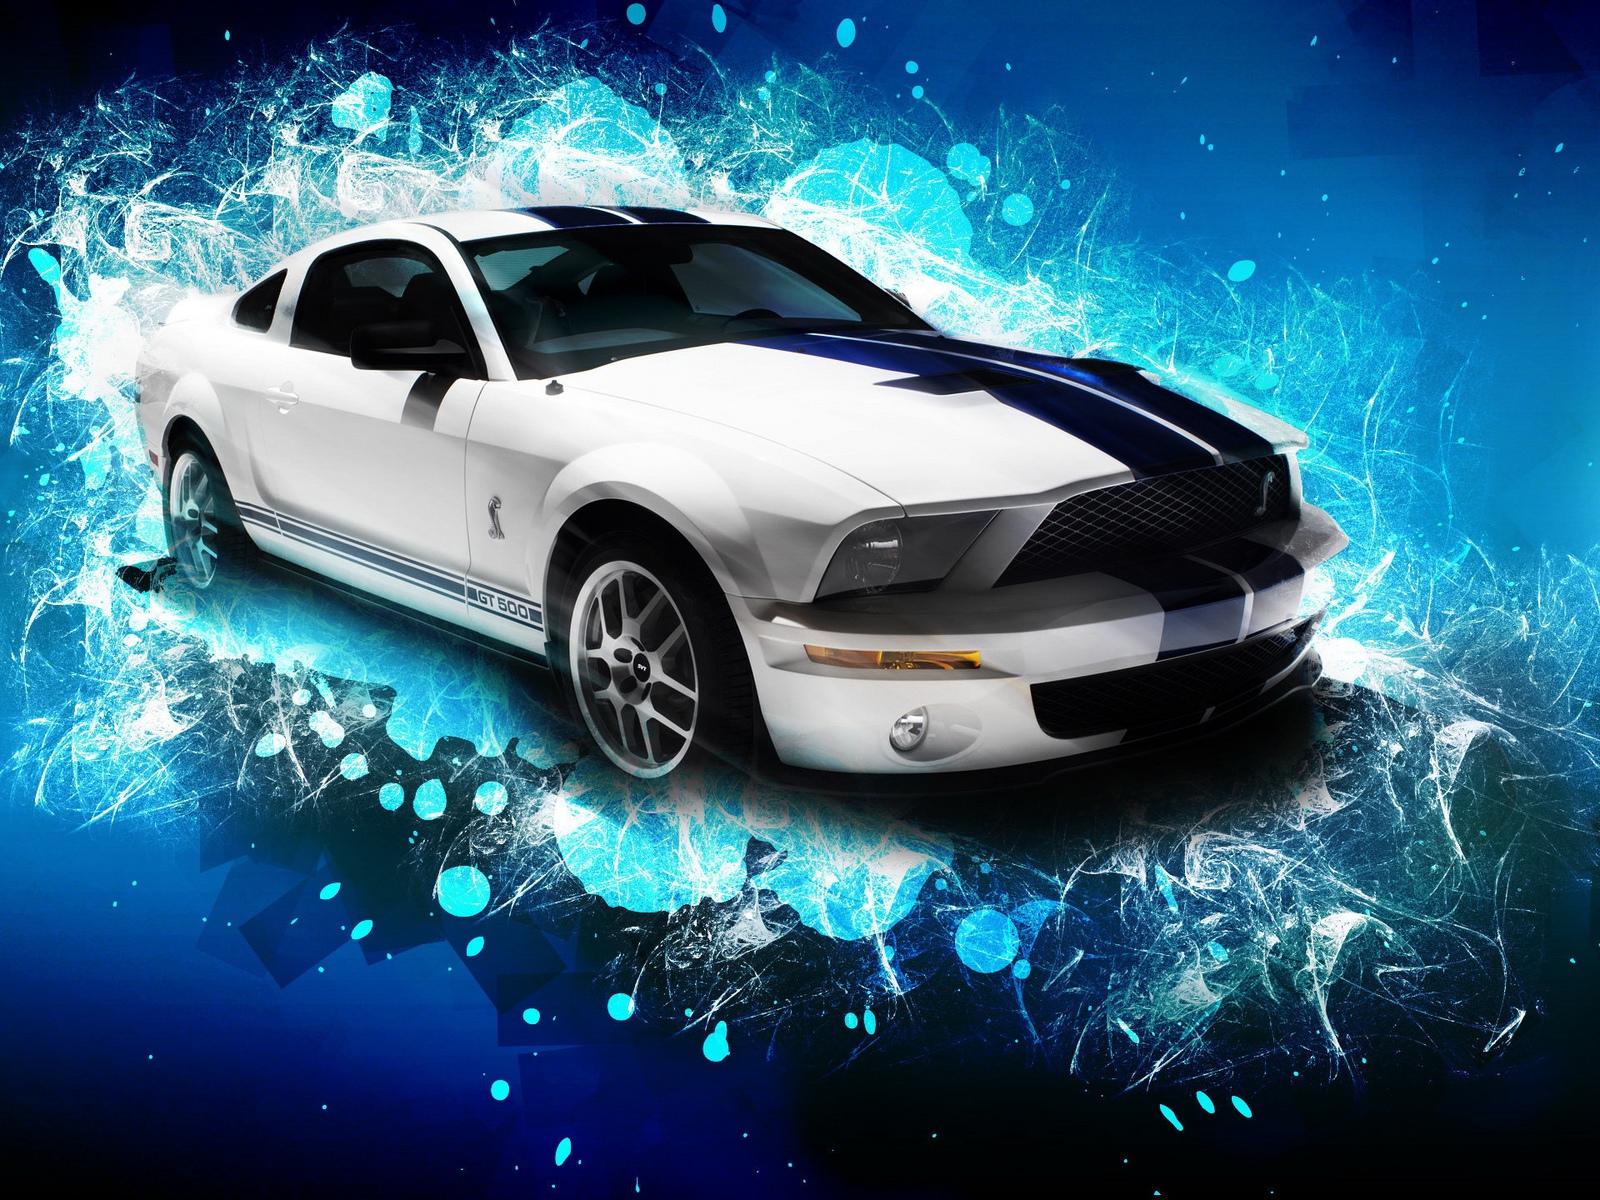 Hd Cool Car Wallpapers 1600x1200